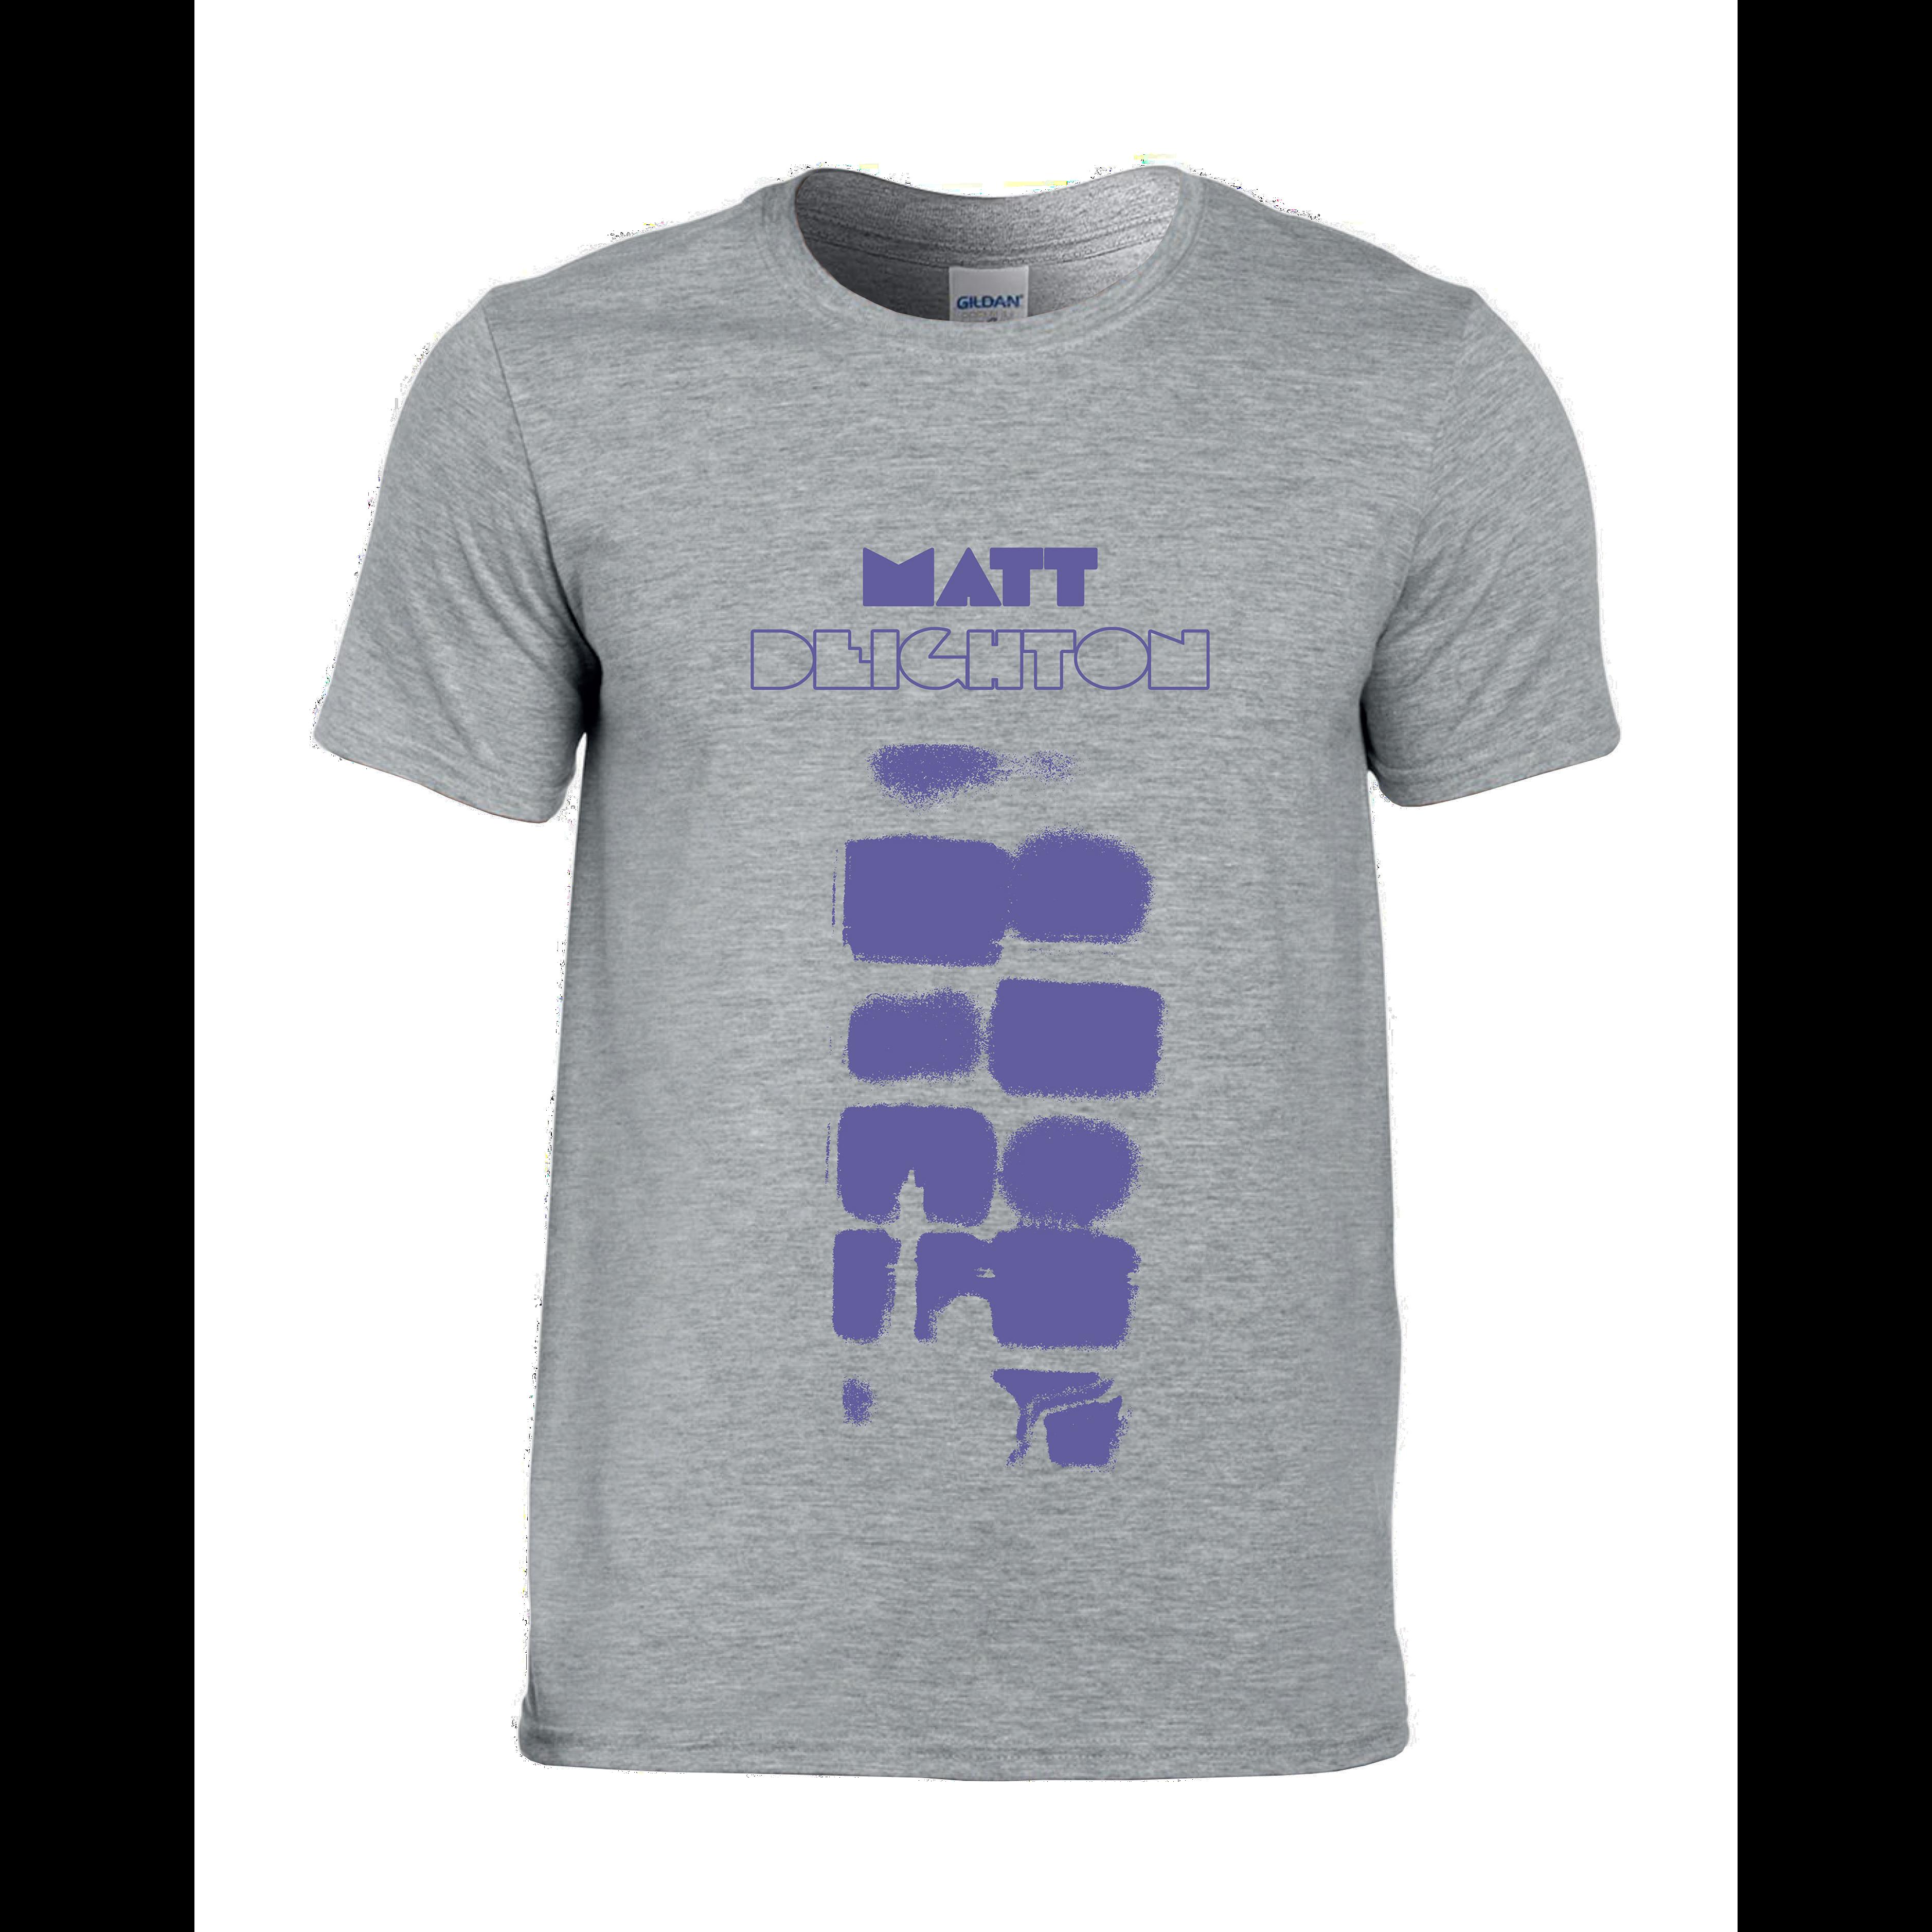 Buy Online Matt Deighton - Grey T-Shirt